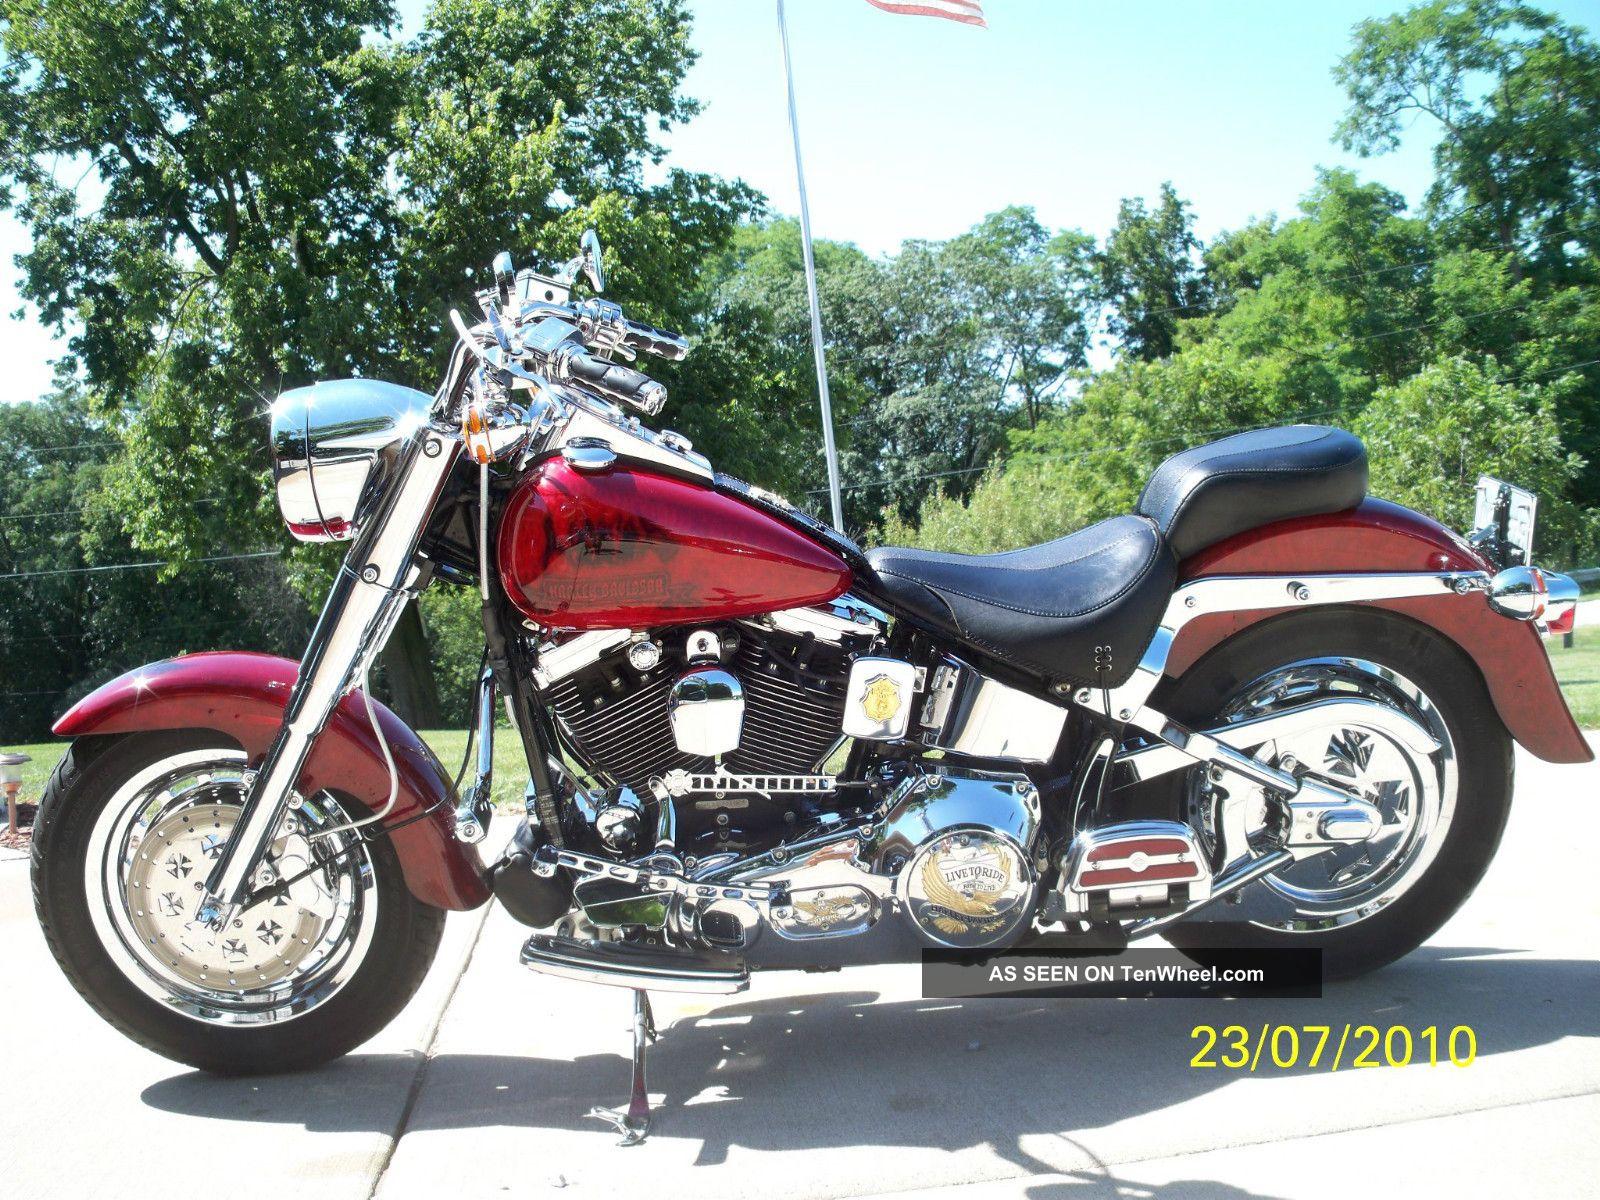 1994 Harley Davidson Fatboy Memorial Theme Fire Bike Softail photo